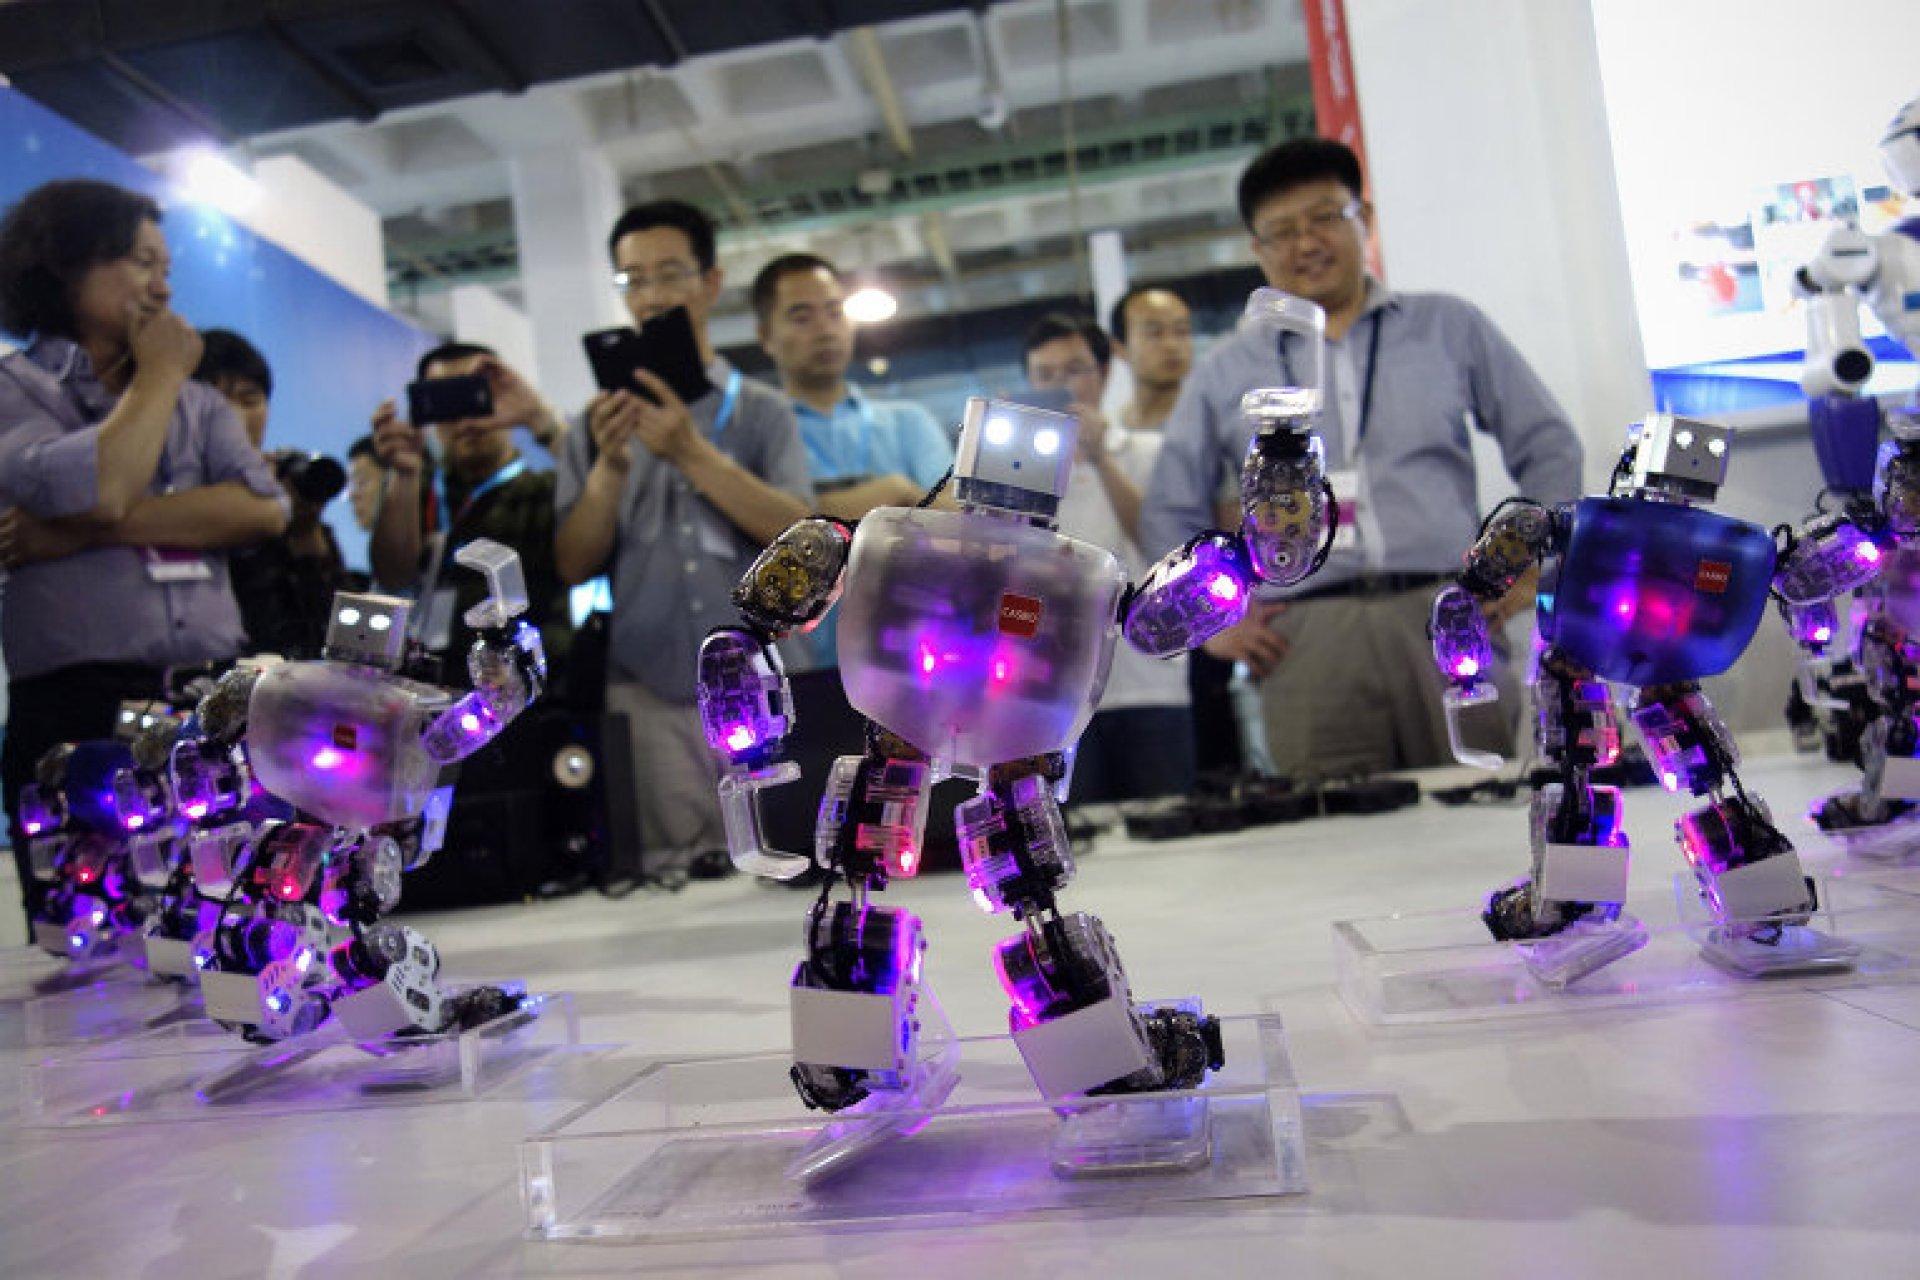 chinas high tech future emerges - HD1080×769